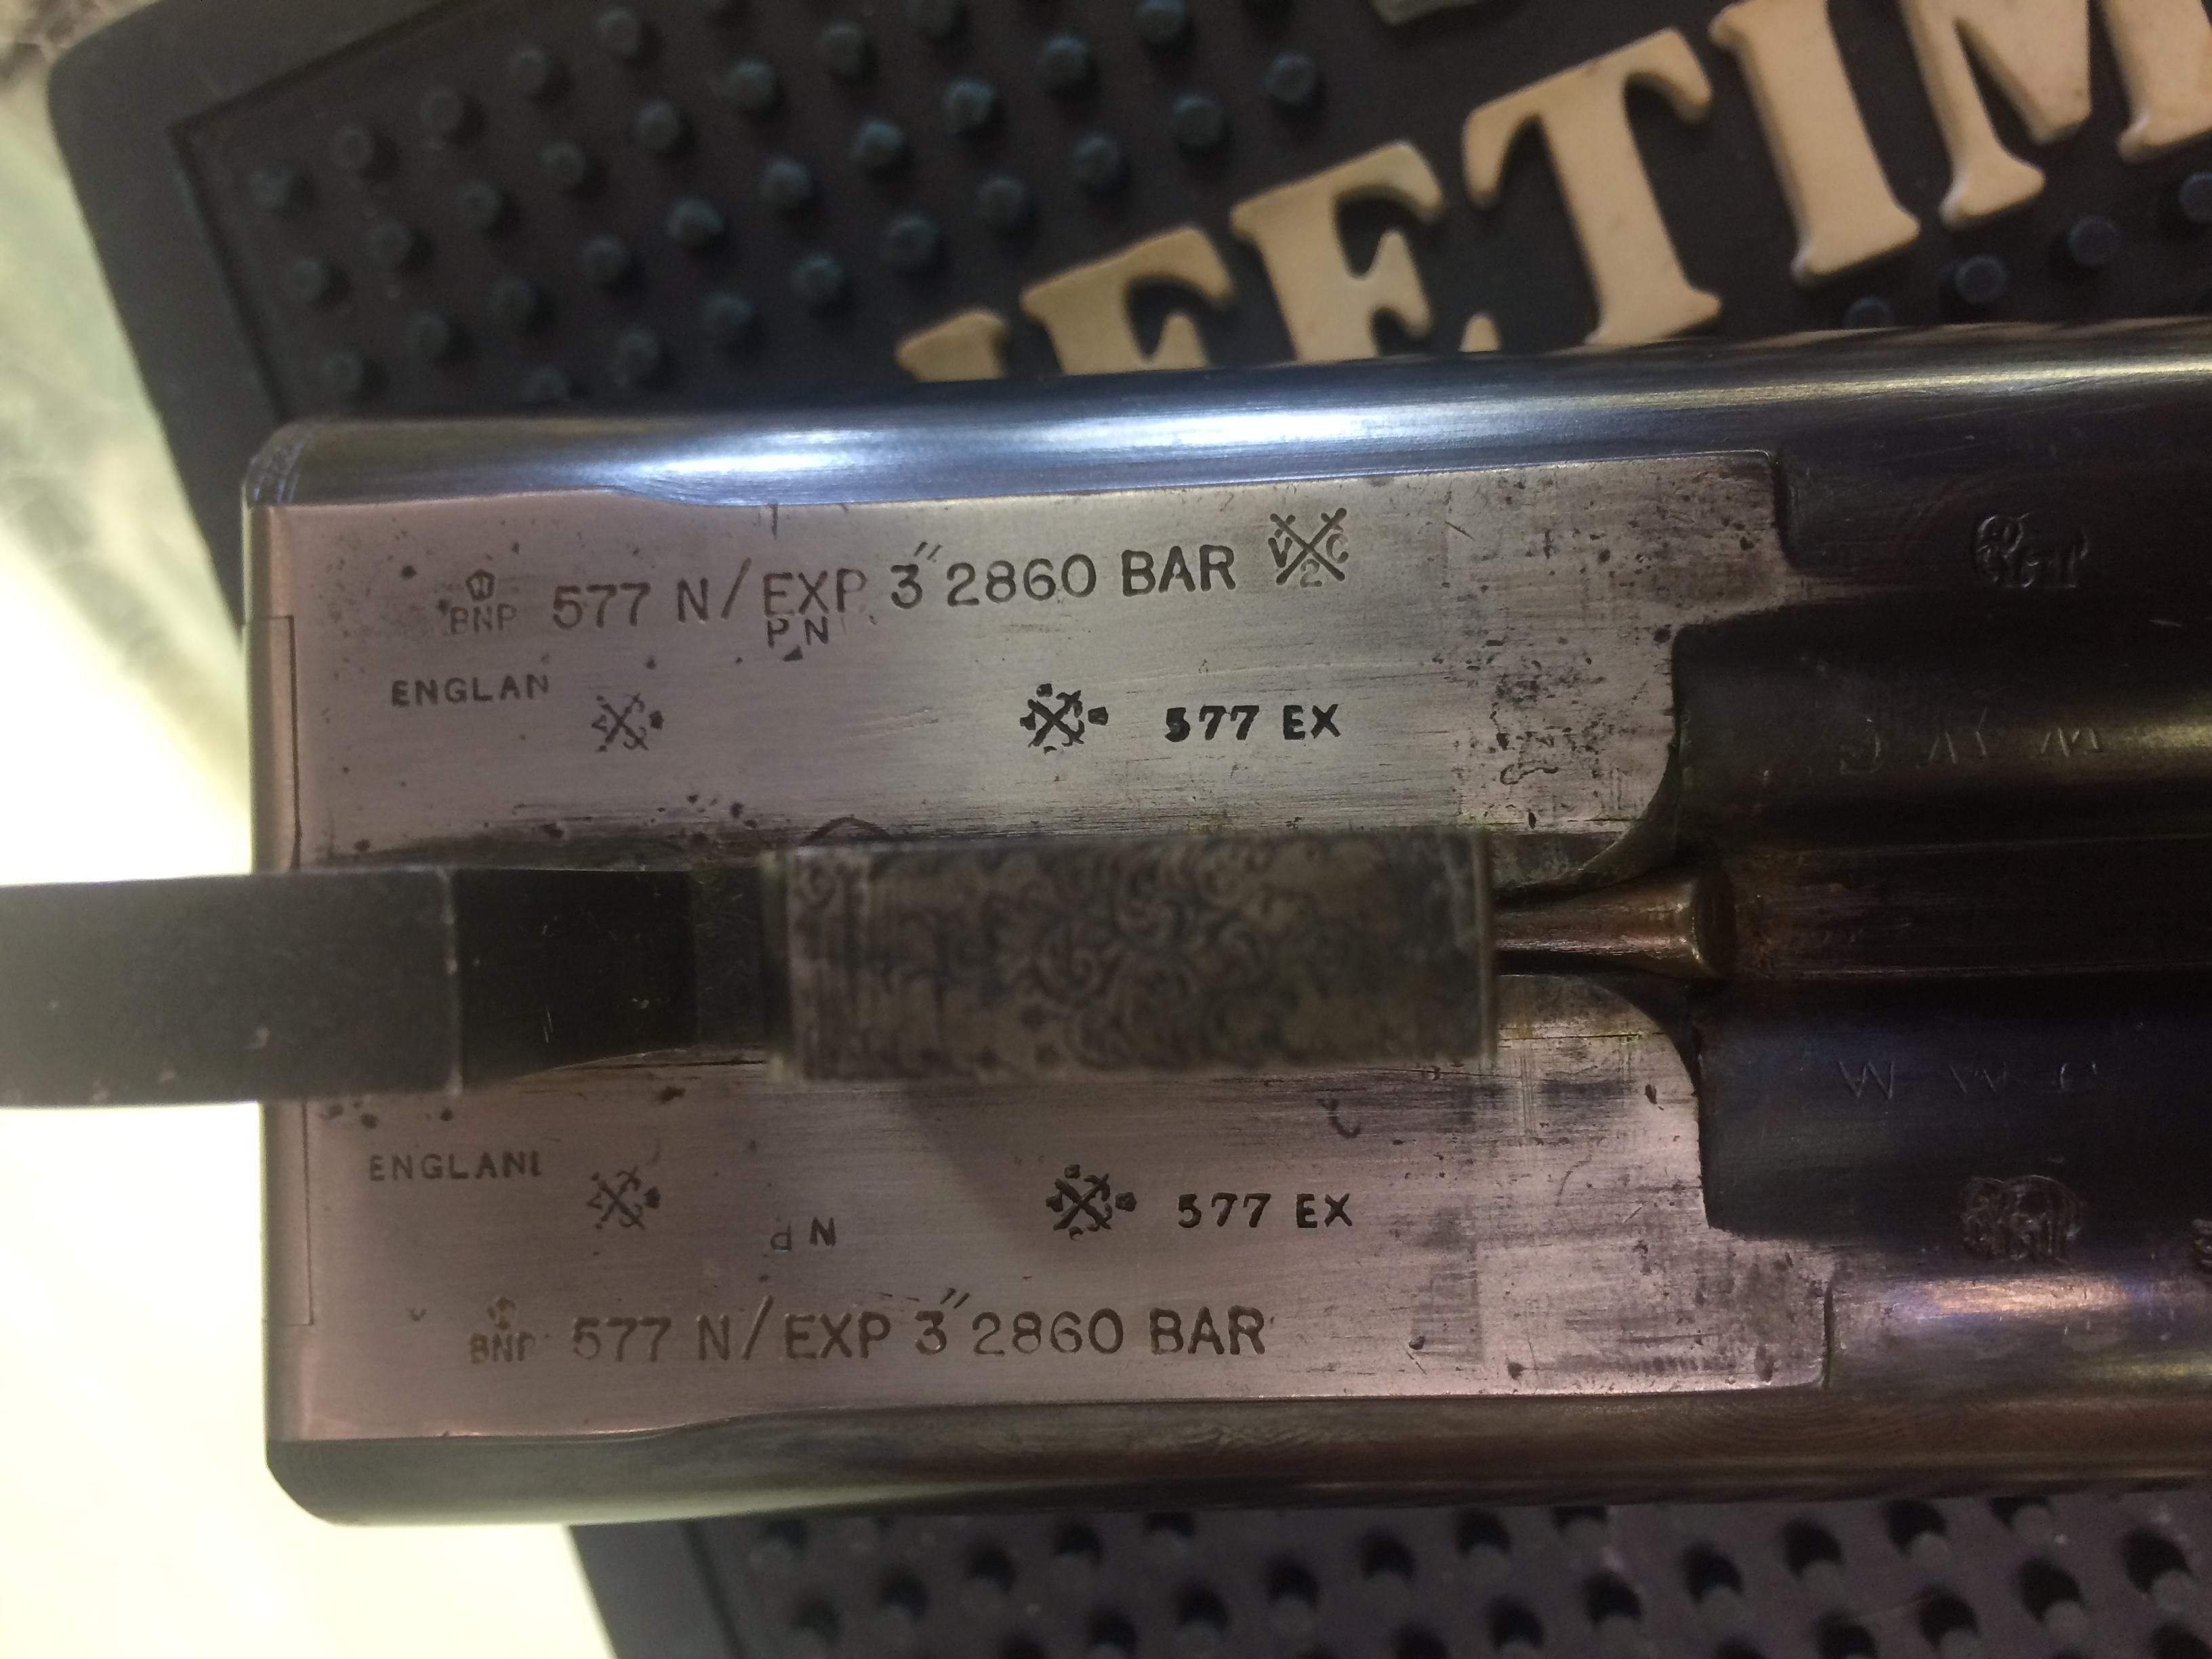 DAB7606C-9EFB-41E5-9A51-AAF3BB3500EE.jpeg